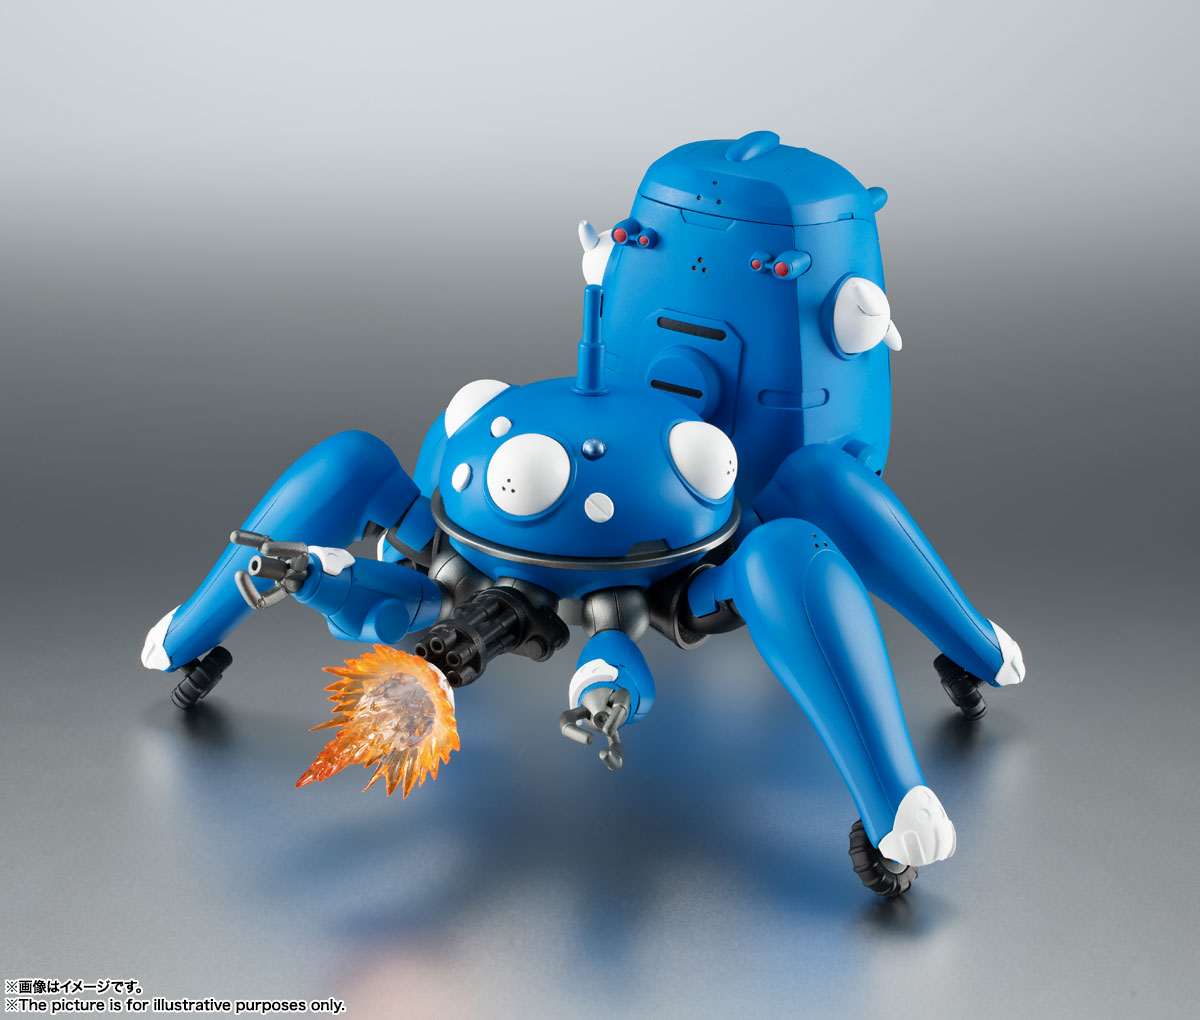 ROBOT魂〈SIDE GHOST〉『タチコマ -攻殻機動隊 S.A.C. 2nd GIG&SAC_2045-』可動フィギュア-004